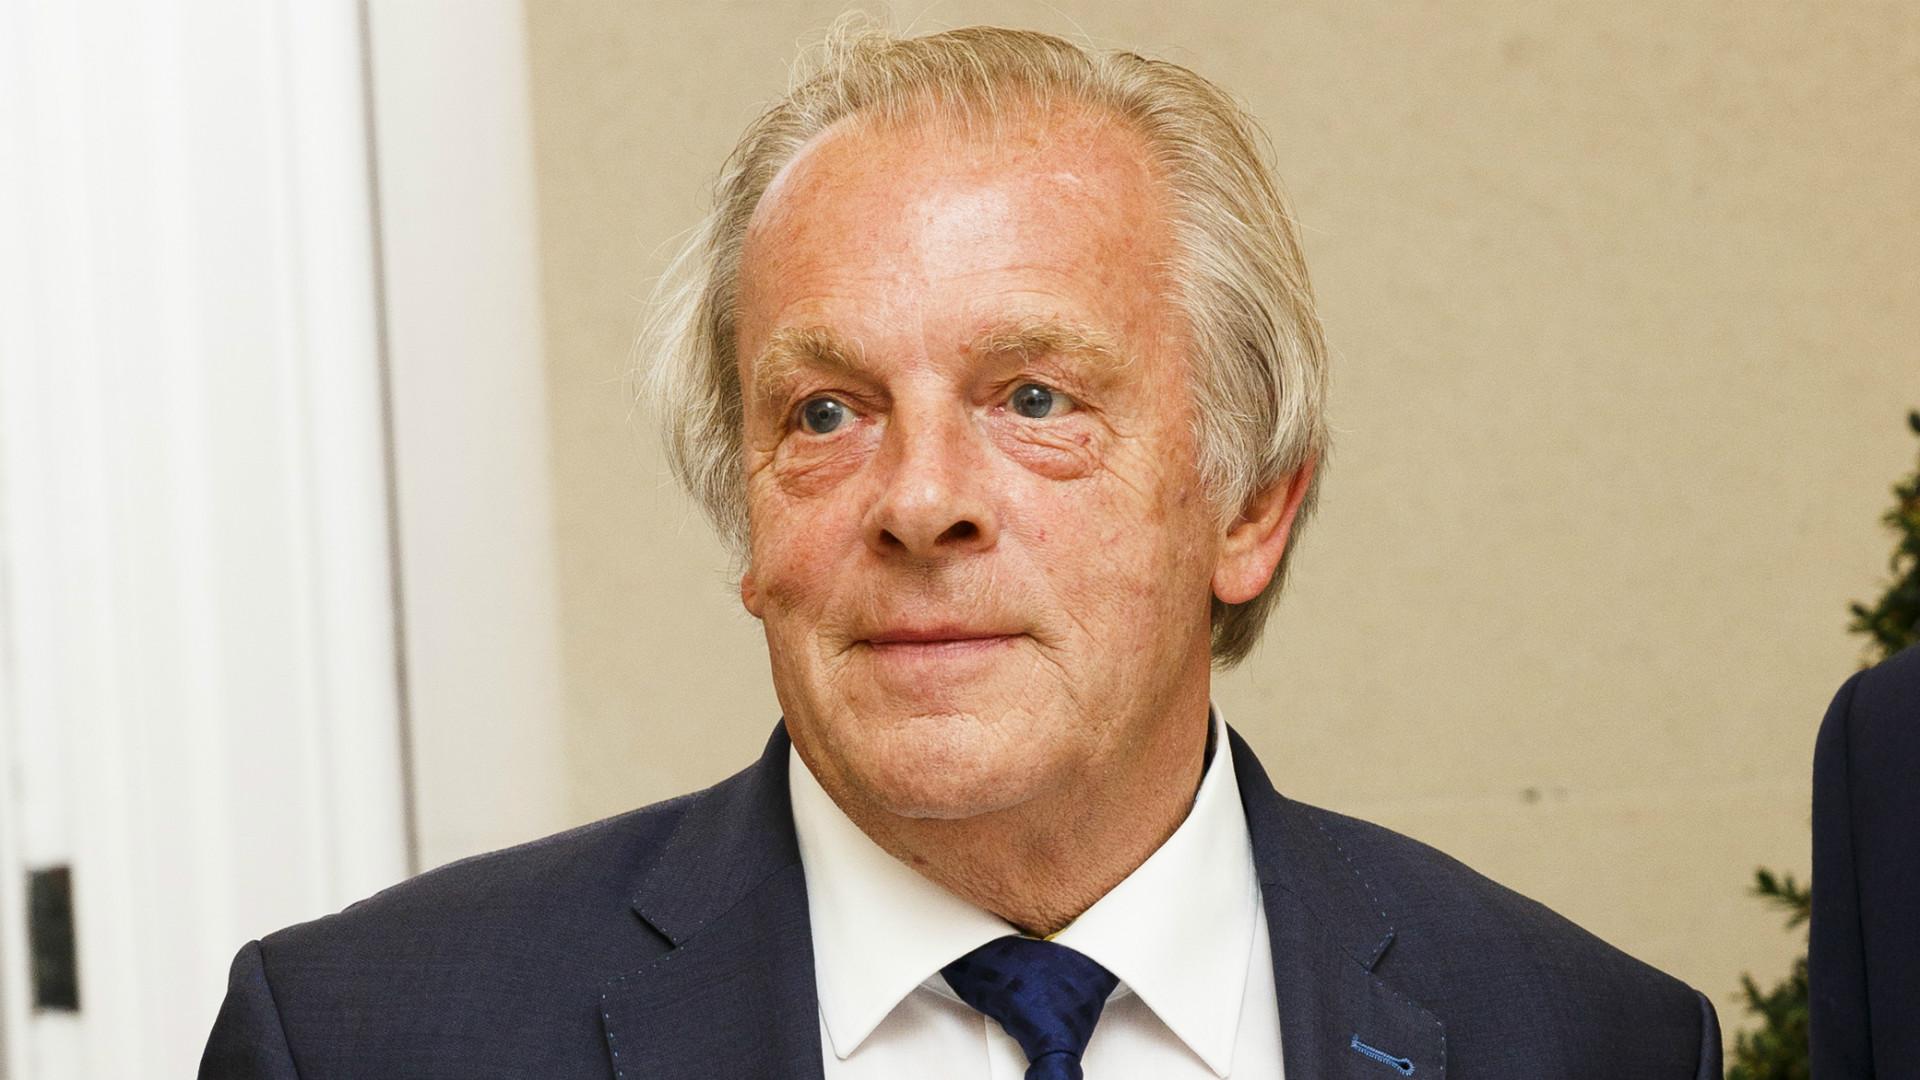 Coronavirus: PFA boss Taylor reveals shortened matches proposal